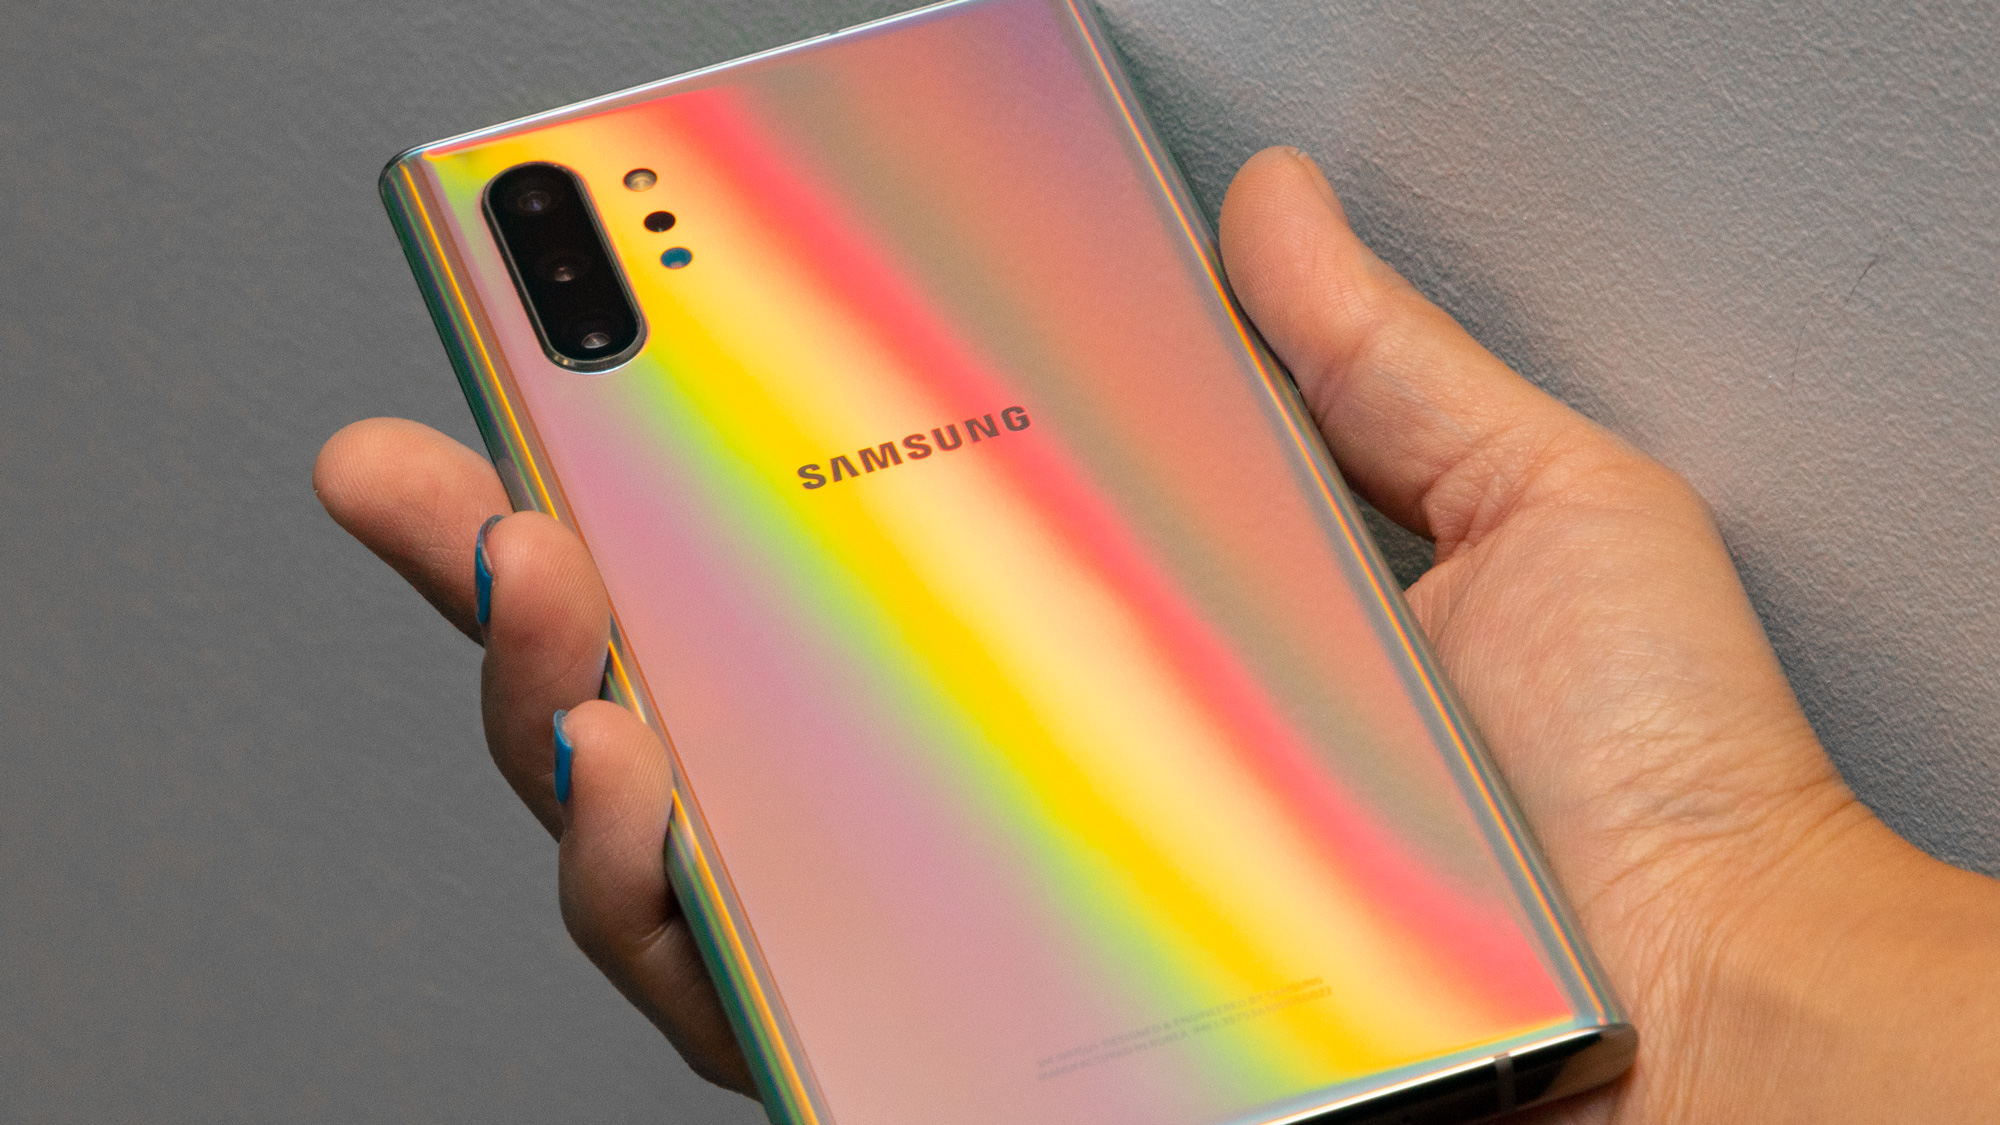 Galaxy Note 20 Ultra vs Galaxy Note 10 Plus